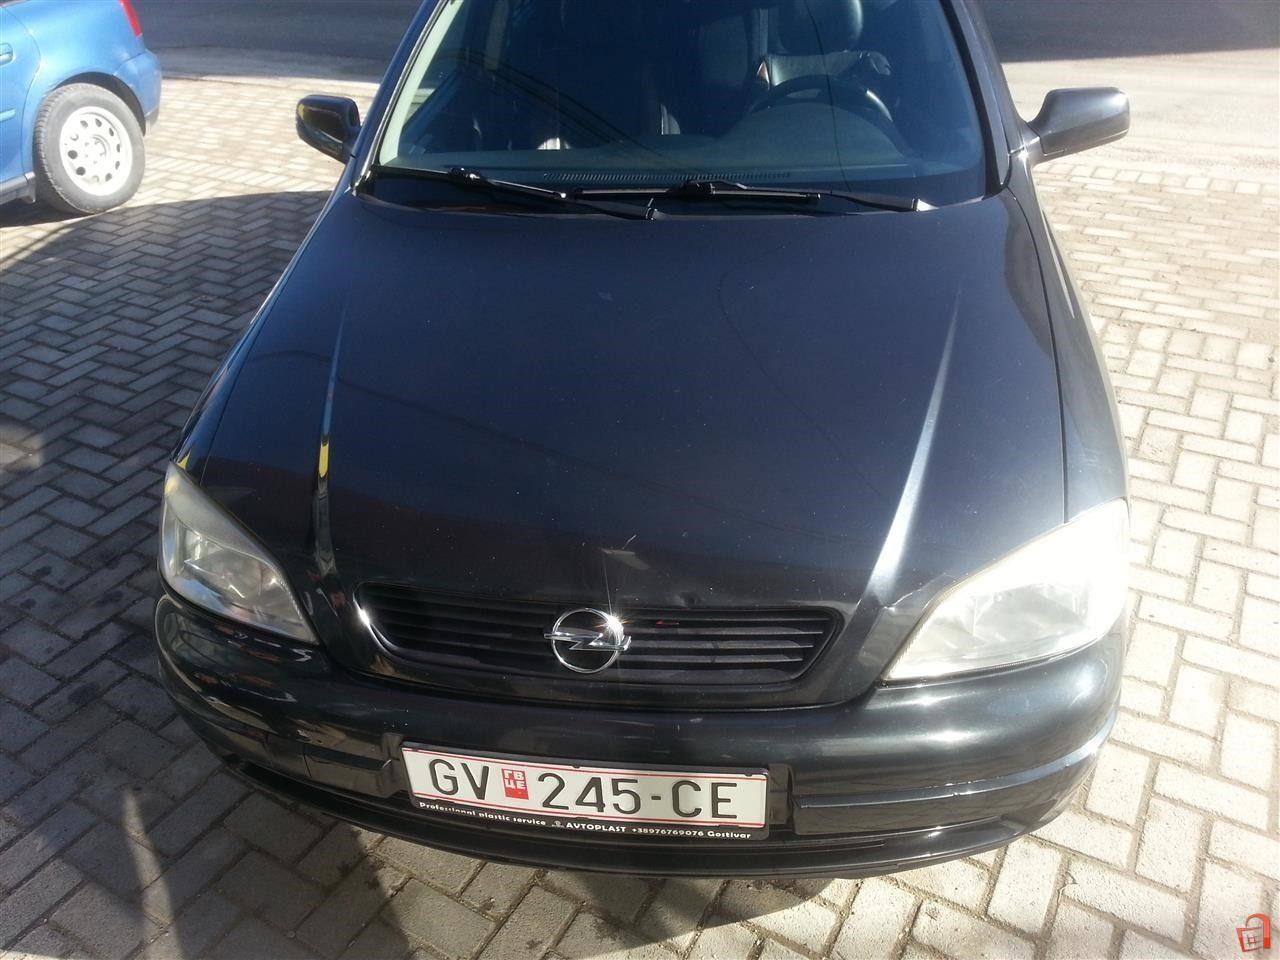 https   www.pazar3.mk Shpallja Jepet-me-qera -Shkup -Shkup ... 692a40d876b40